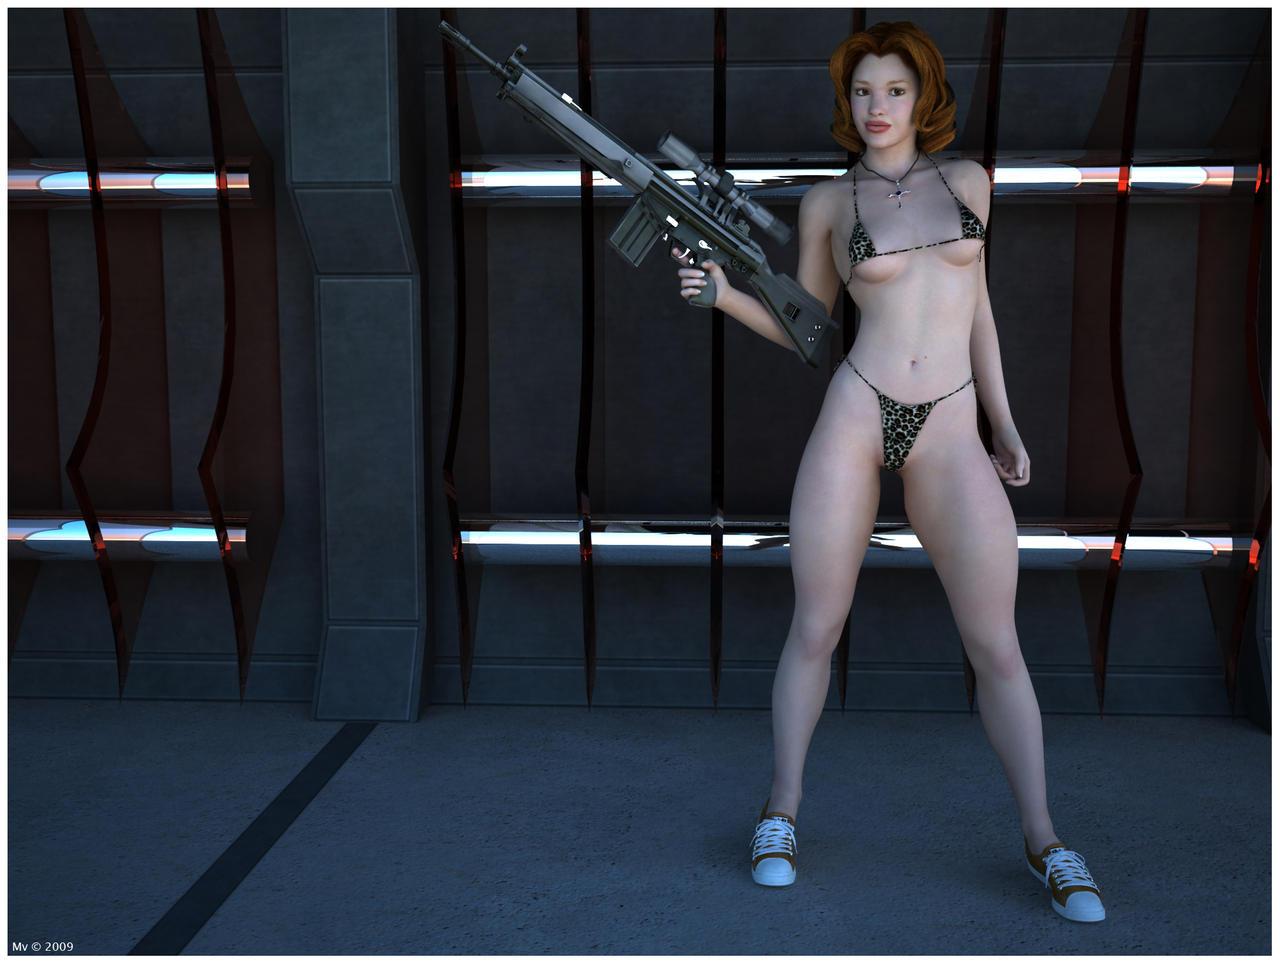 Bikini And Gun 65